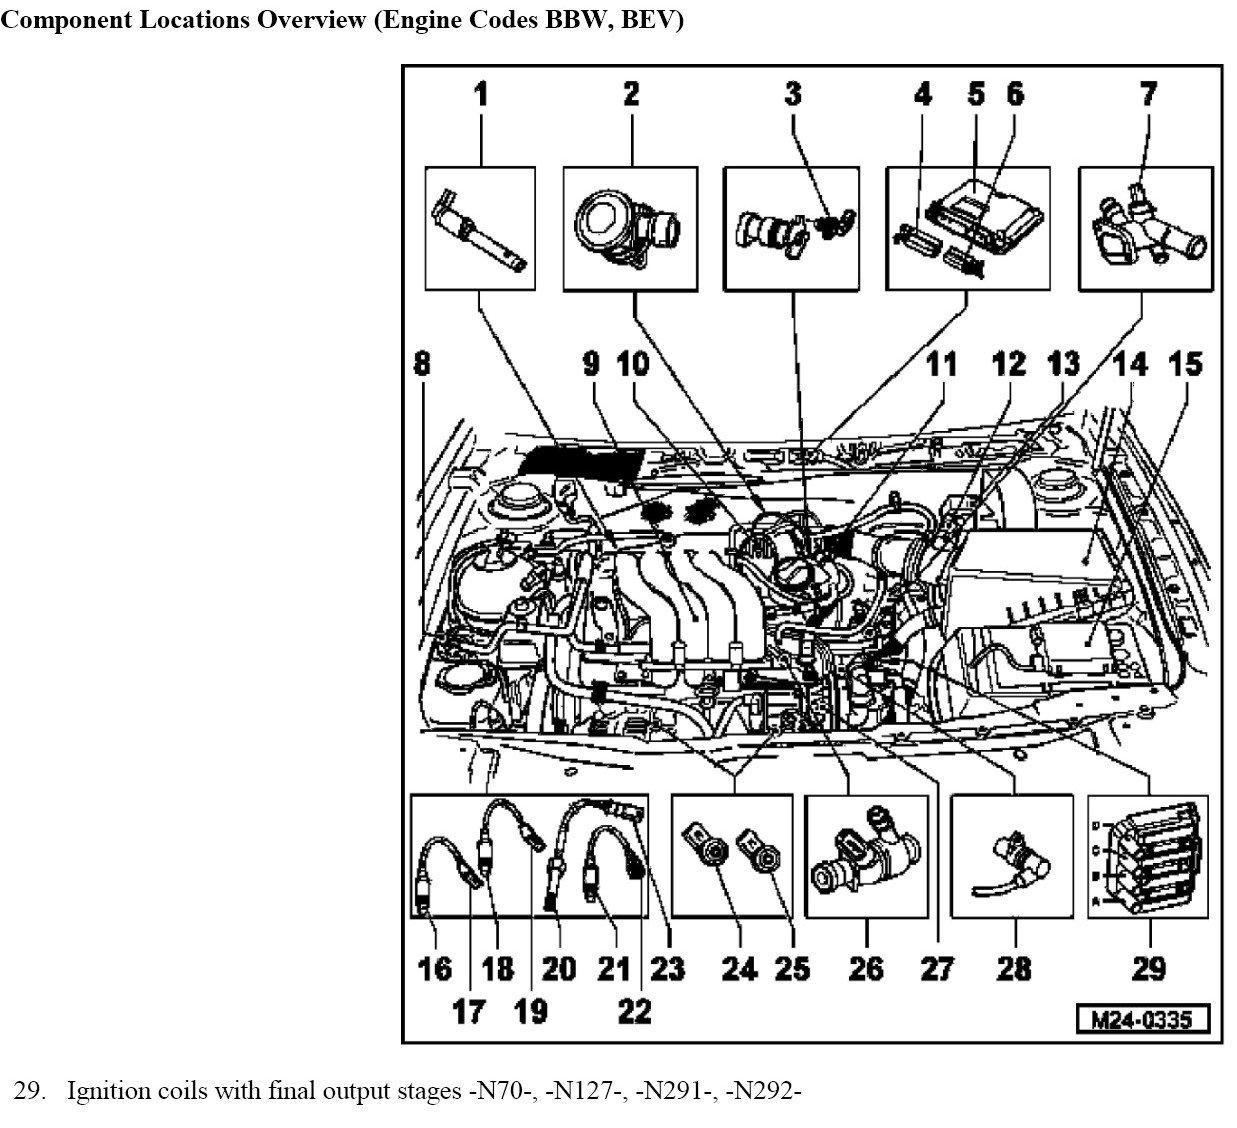 2004 Vw Beetle Engine Diagram Warrior 350 Cdi Wiring Diagram Begeboy Wiring Diagram Source